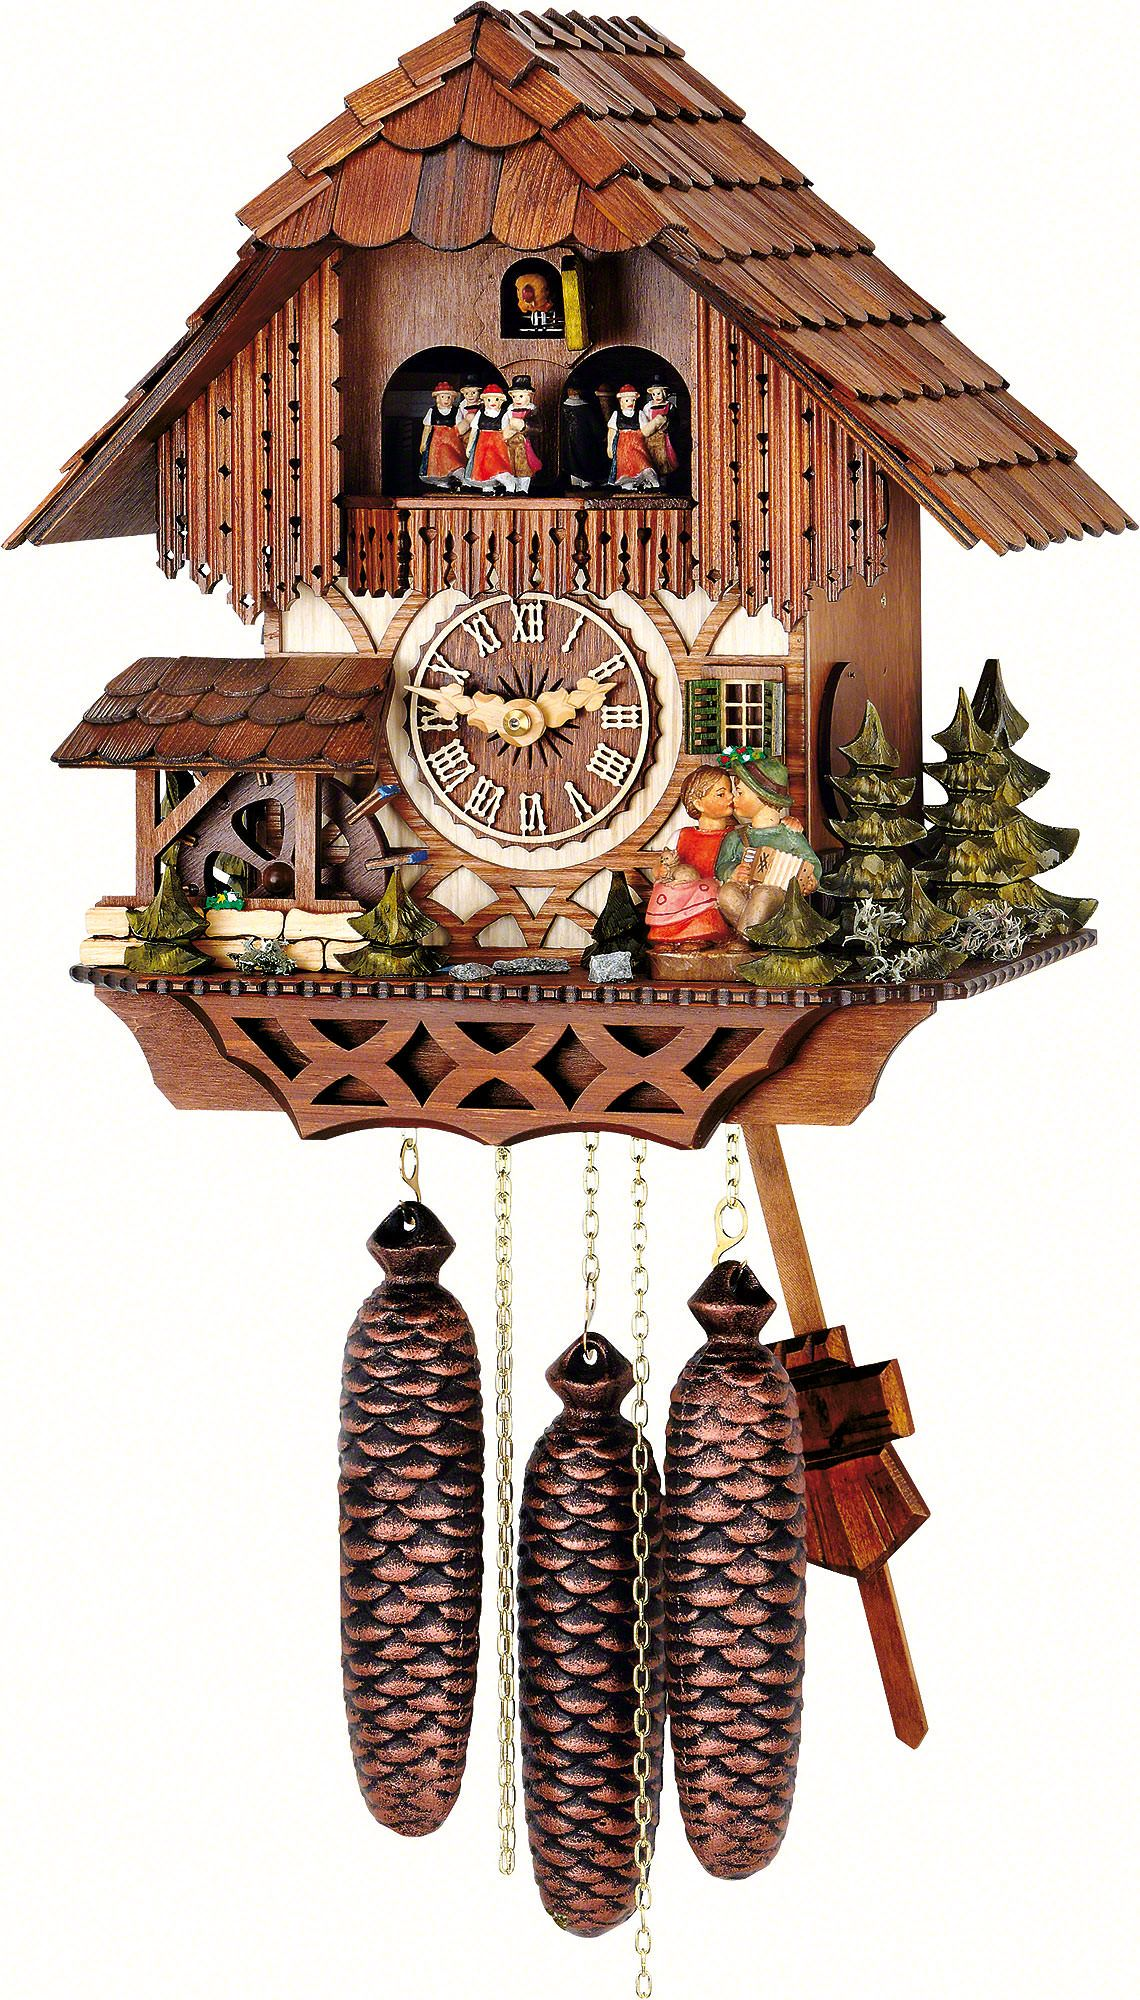 Chalet Cuckoo Clocks Cuckoo Clock 8-day-movement Chalet-Style 32cm by Hubert Herr